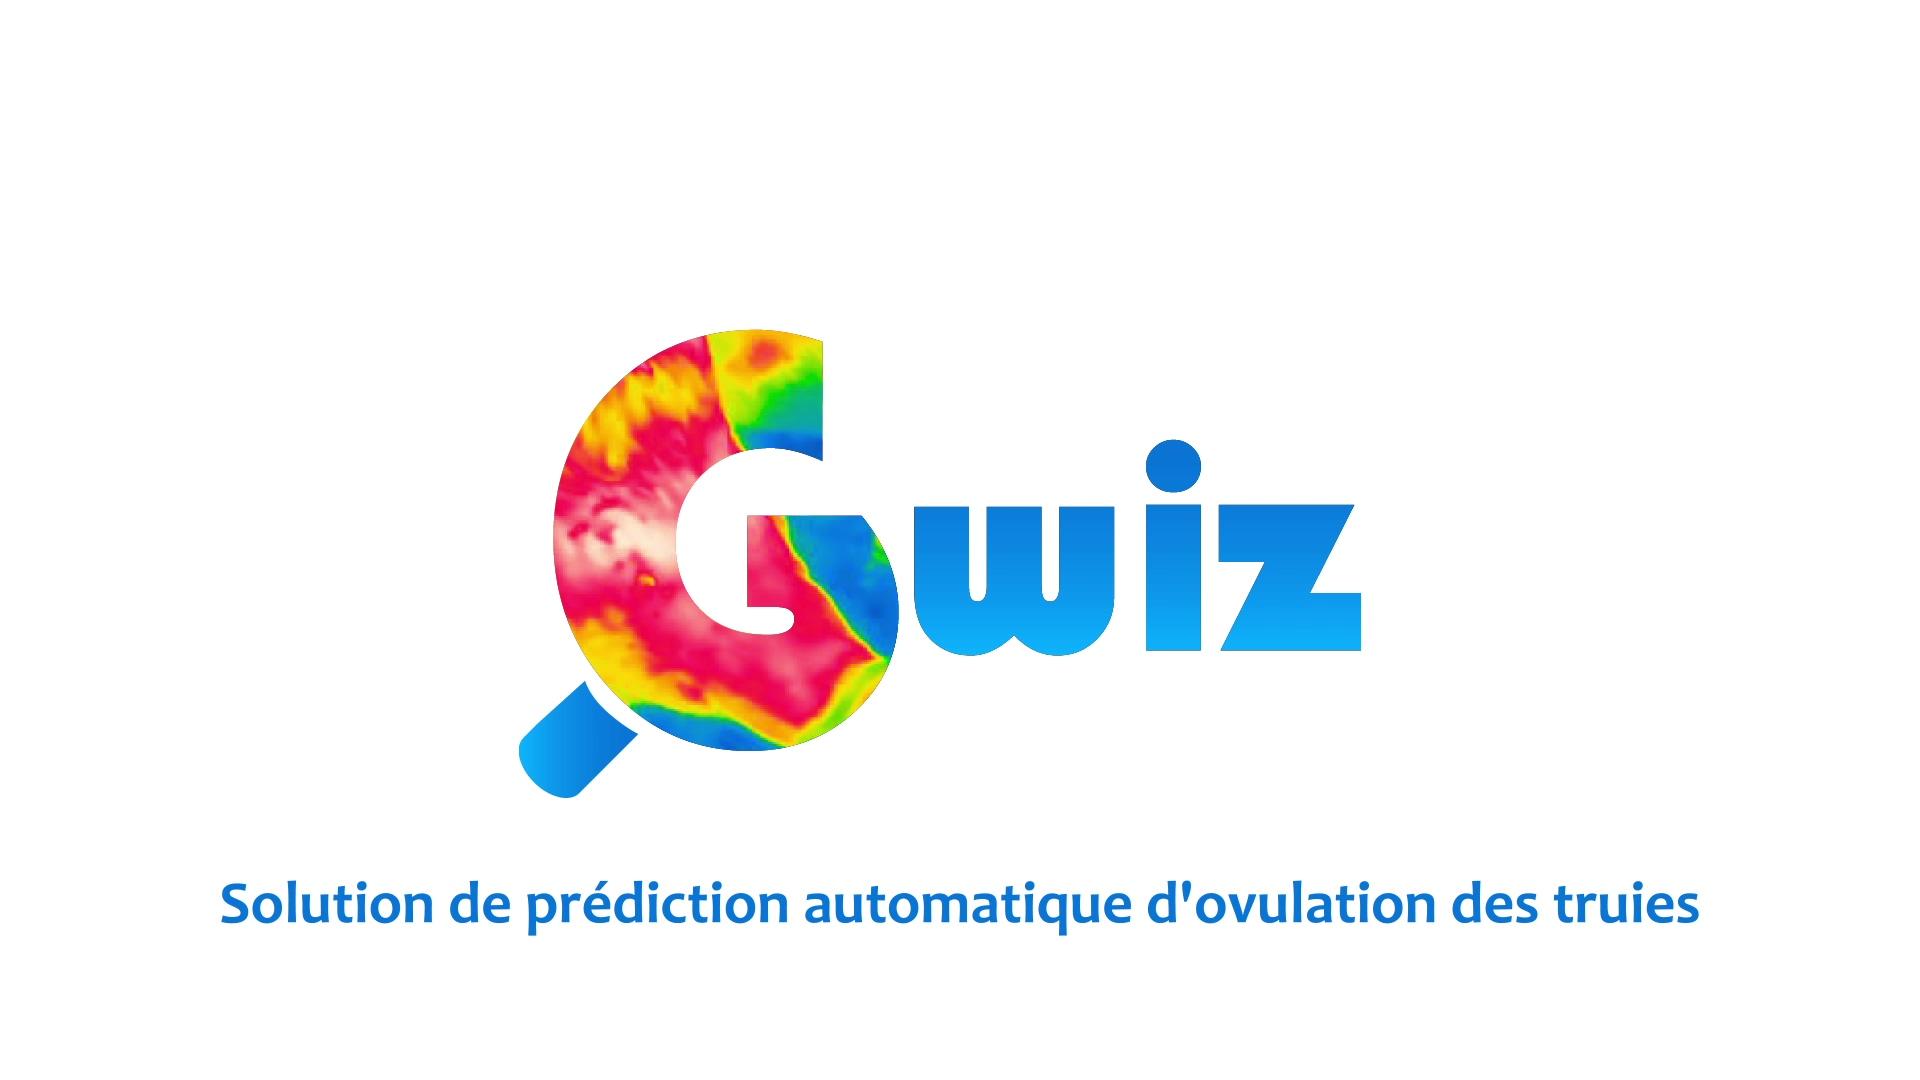 Gwiz-demo-detection-ovulation-truies